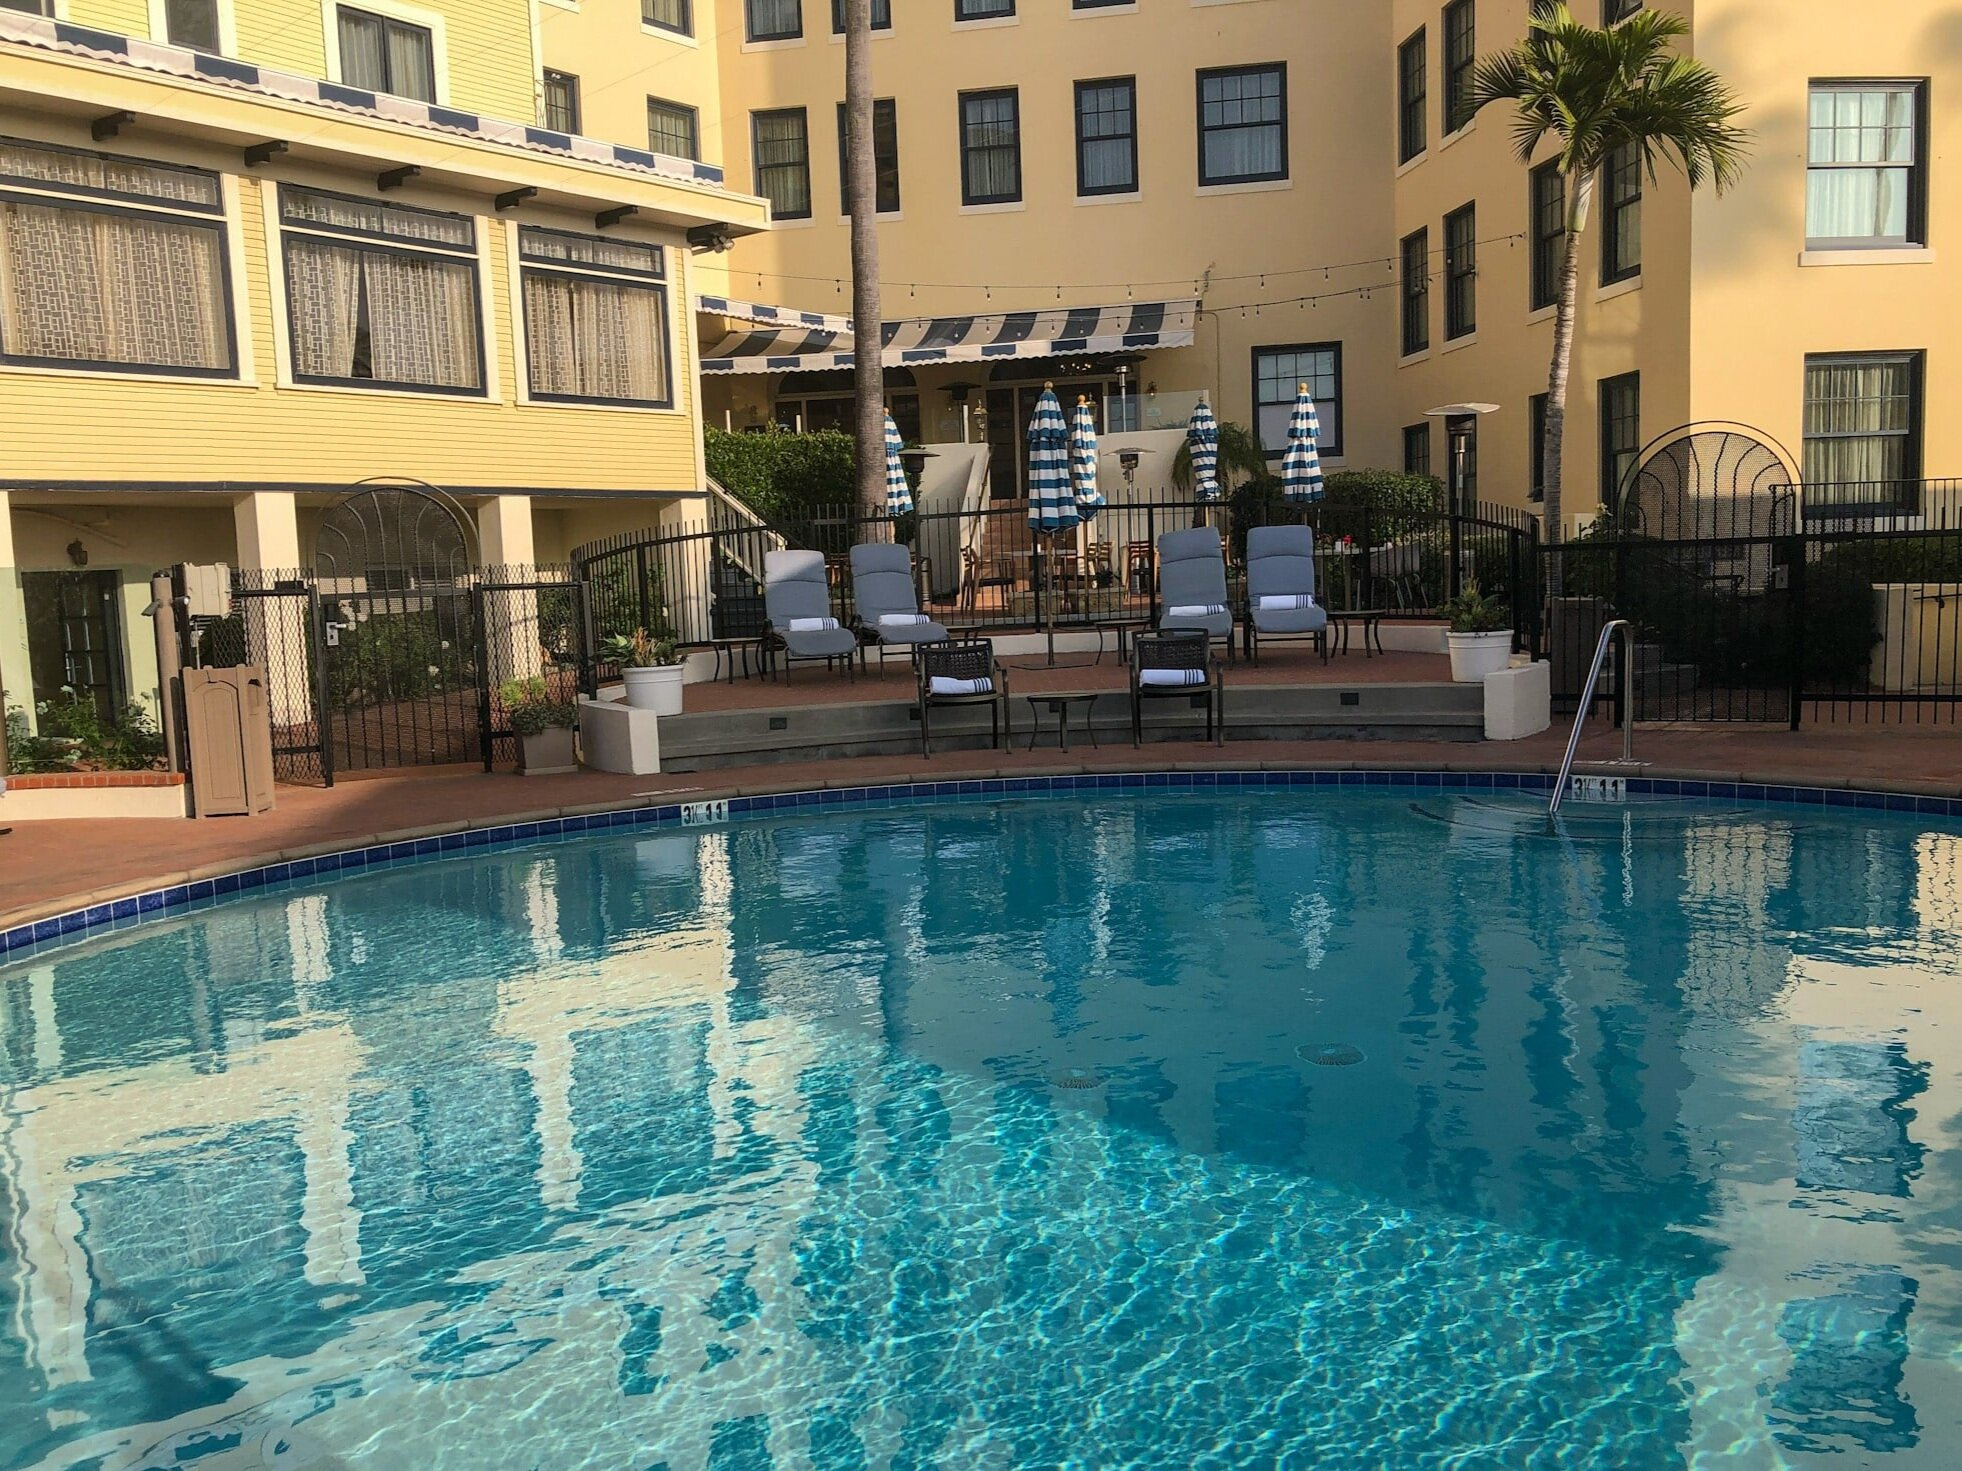 The pool at the Grande Colonial La Jolla Hotel